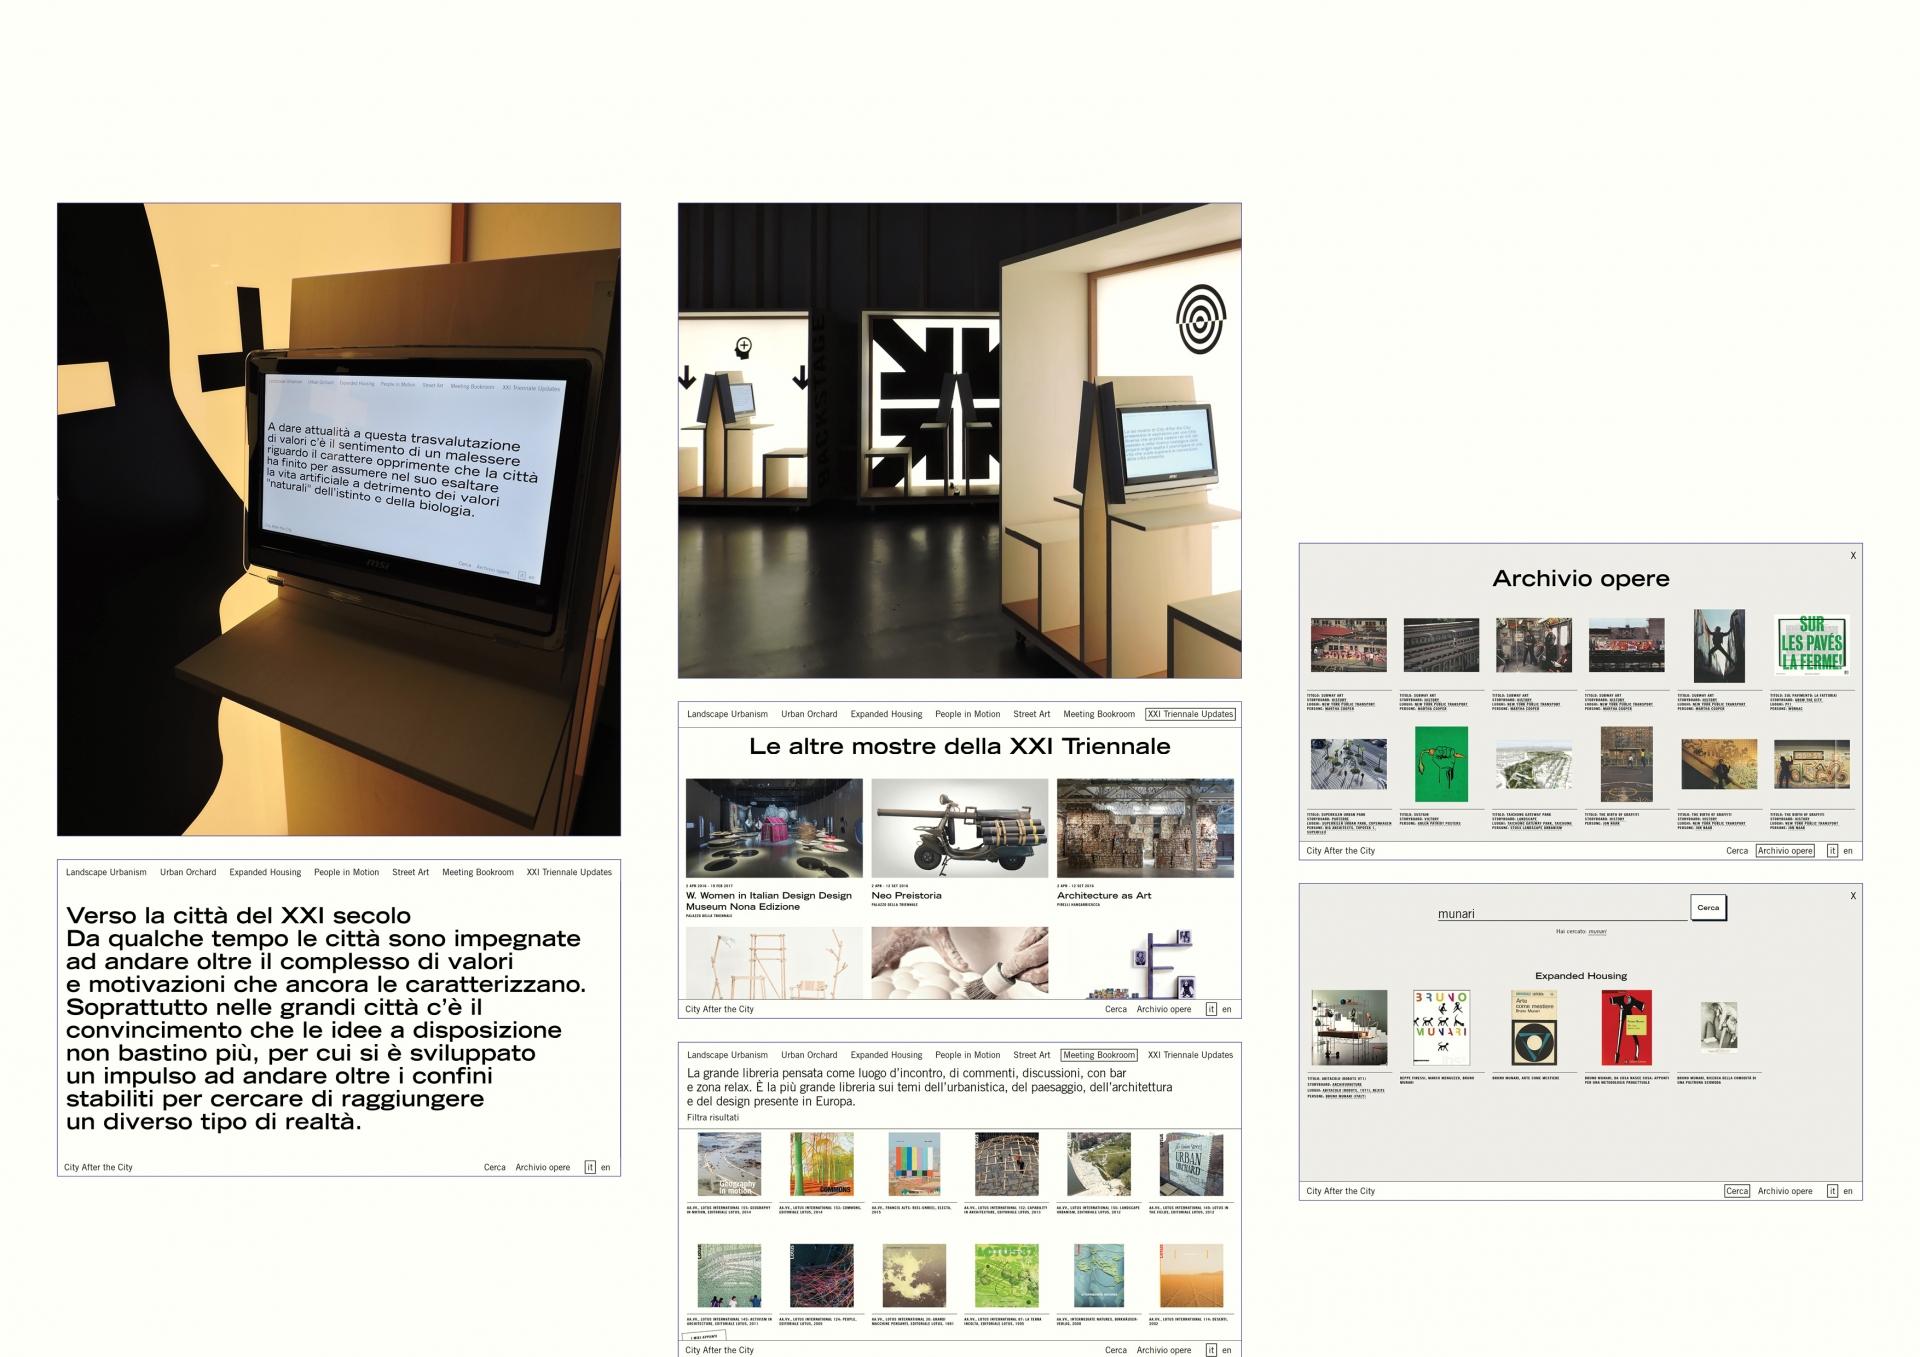 A.C.Busseni digital